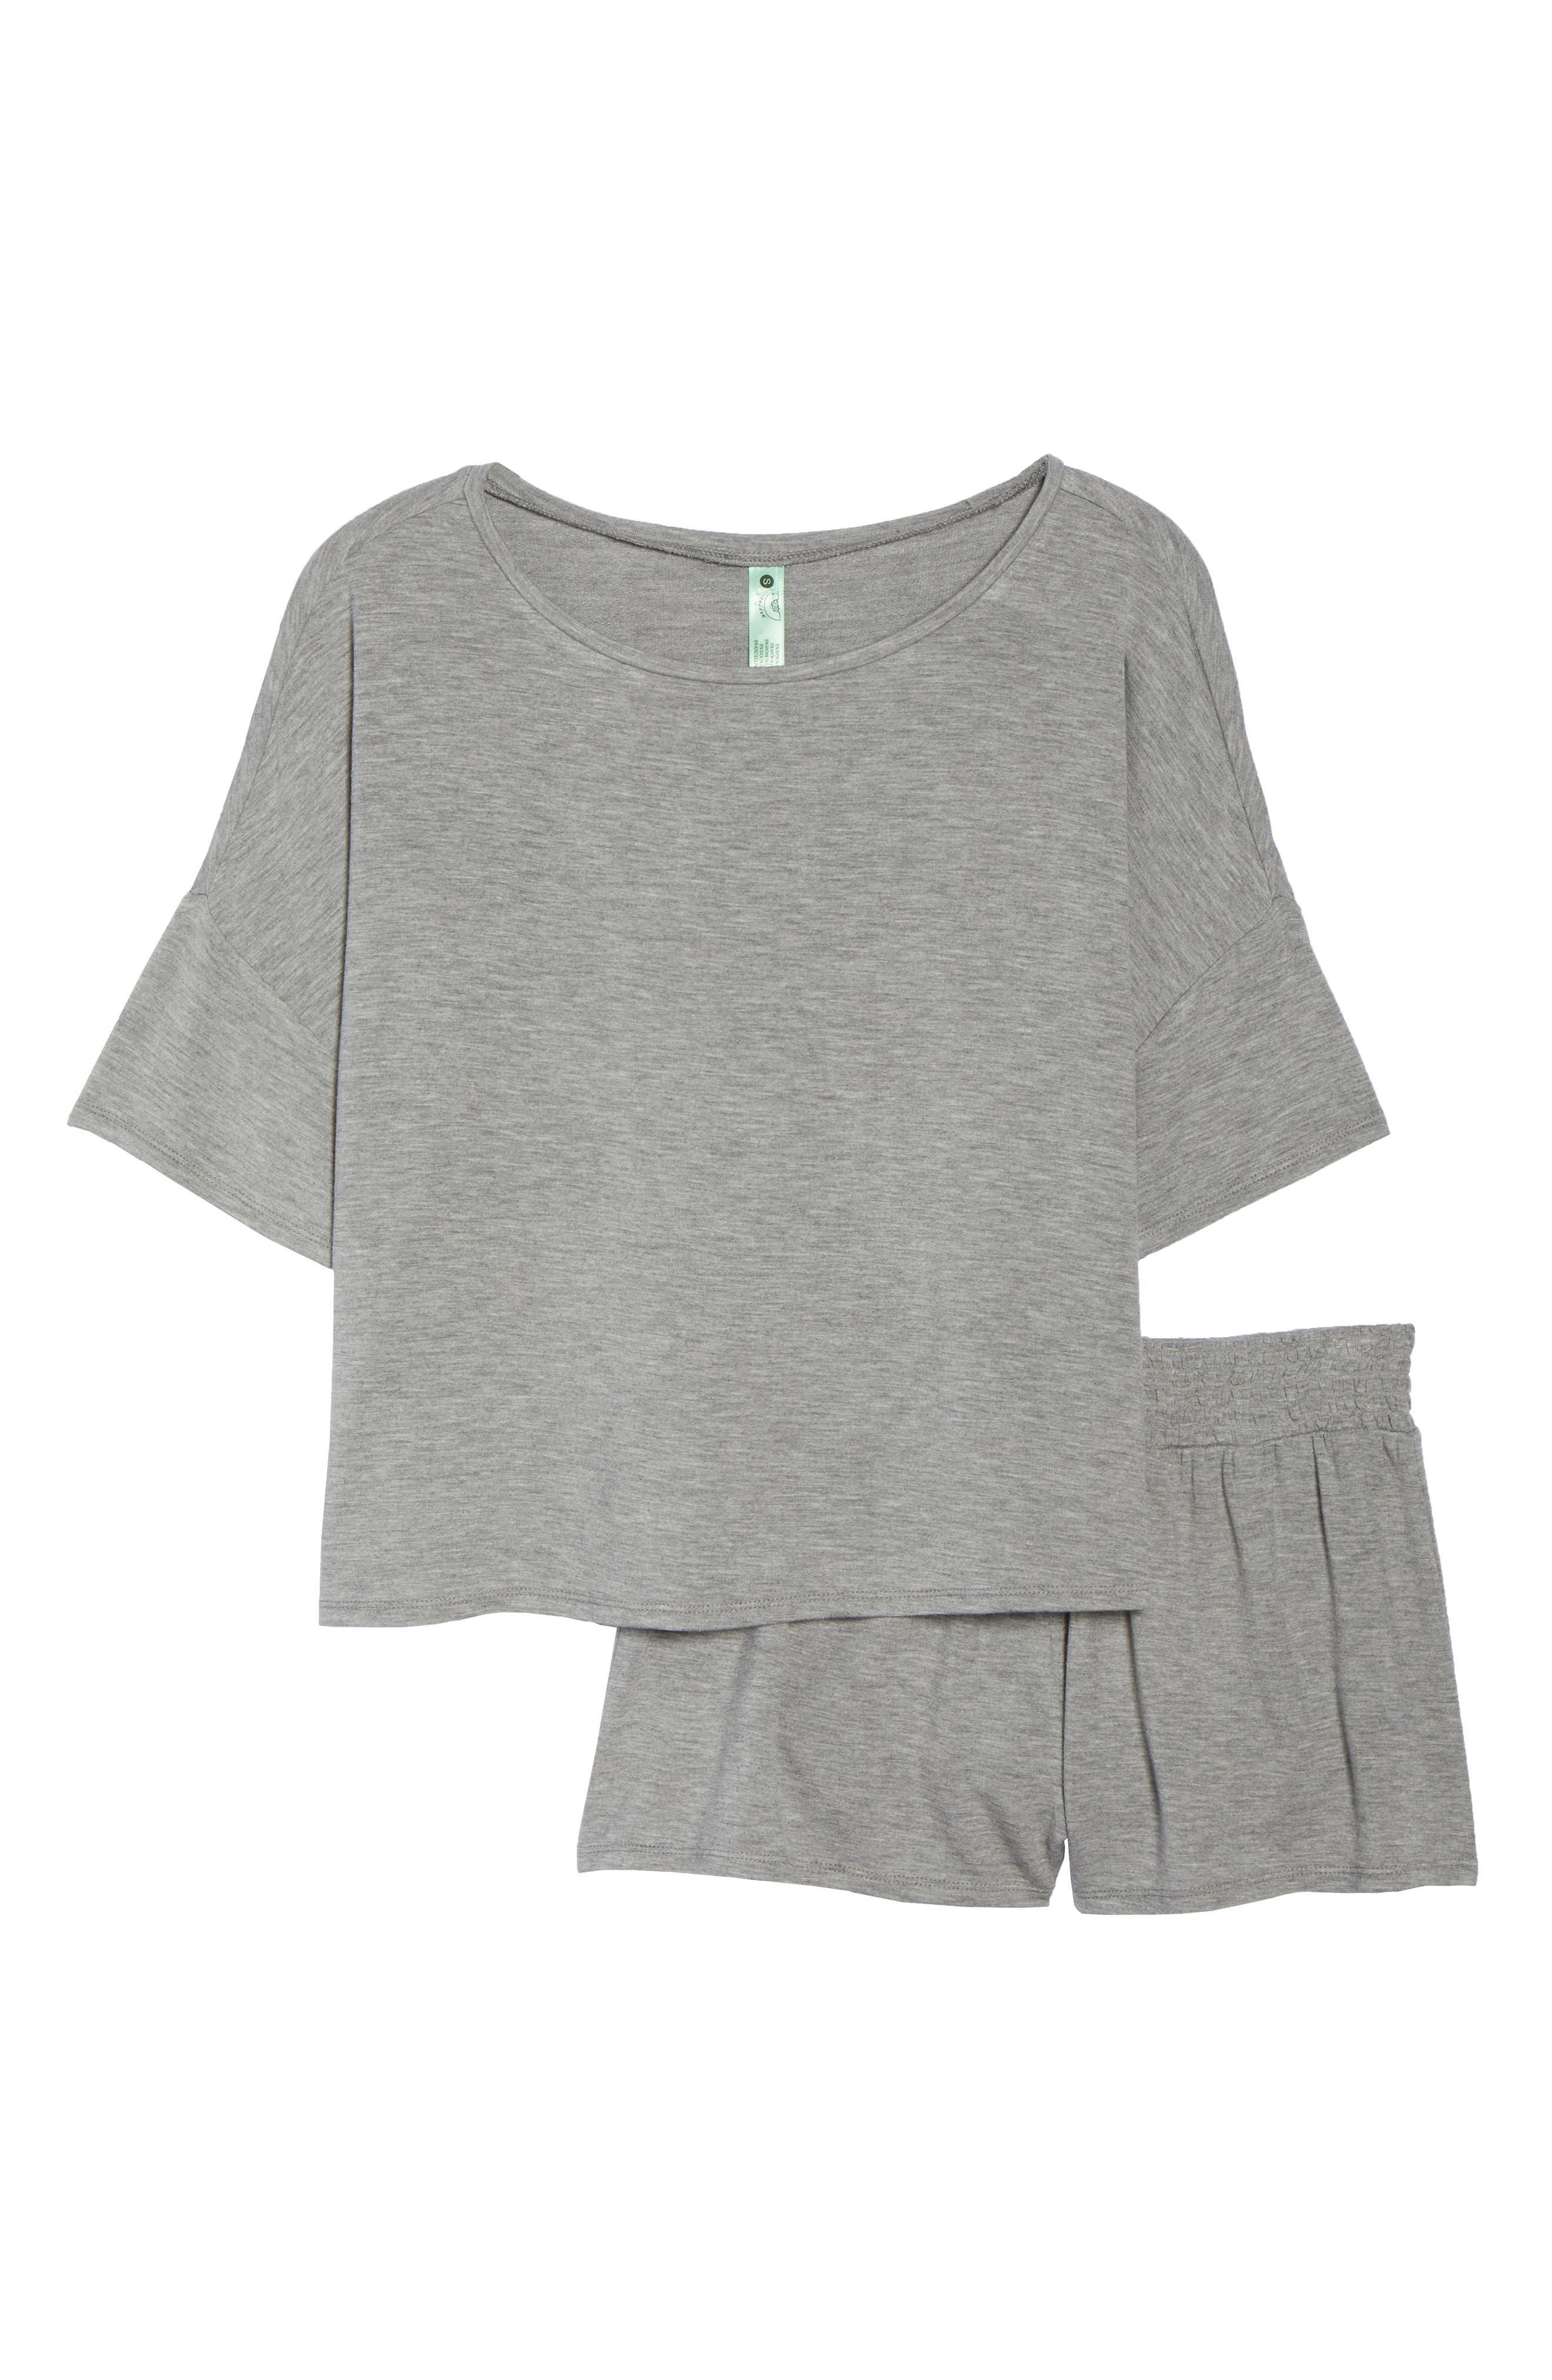 Short Pajamas,                             Alternate thumbnail 6, color,                             053